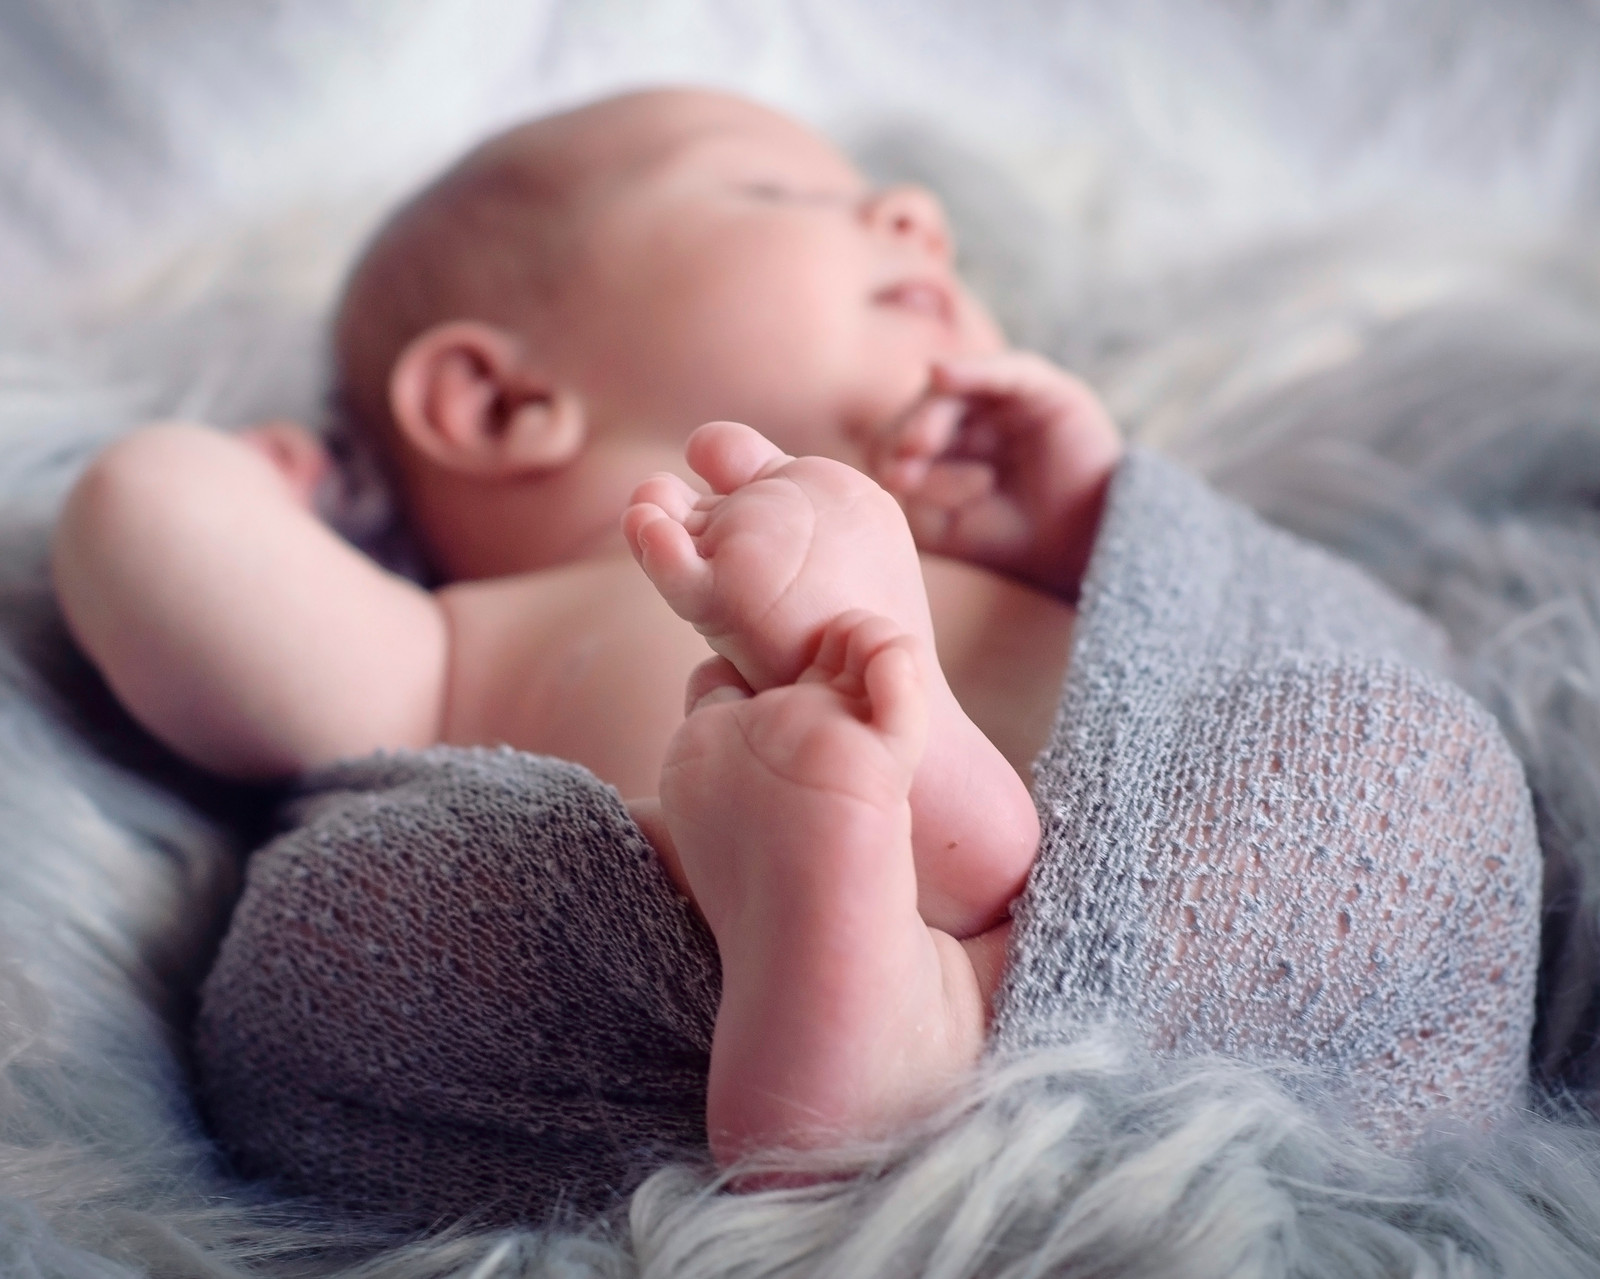 This darling newborn girl was photographed by chantel hunt yuba sutter photographer yuba city ca